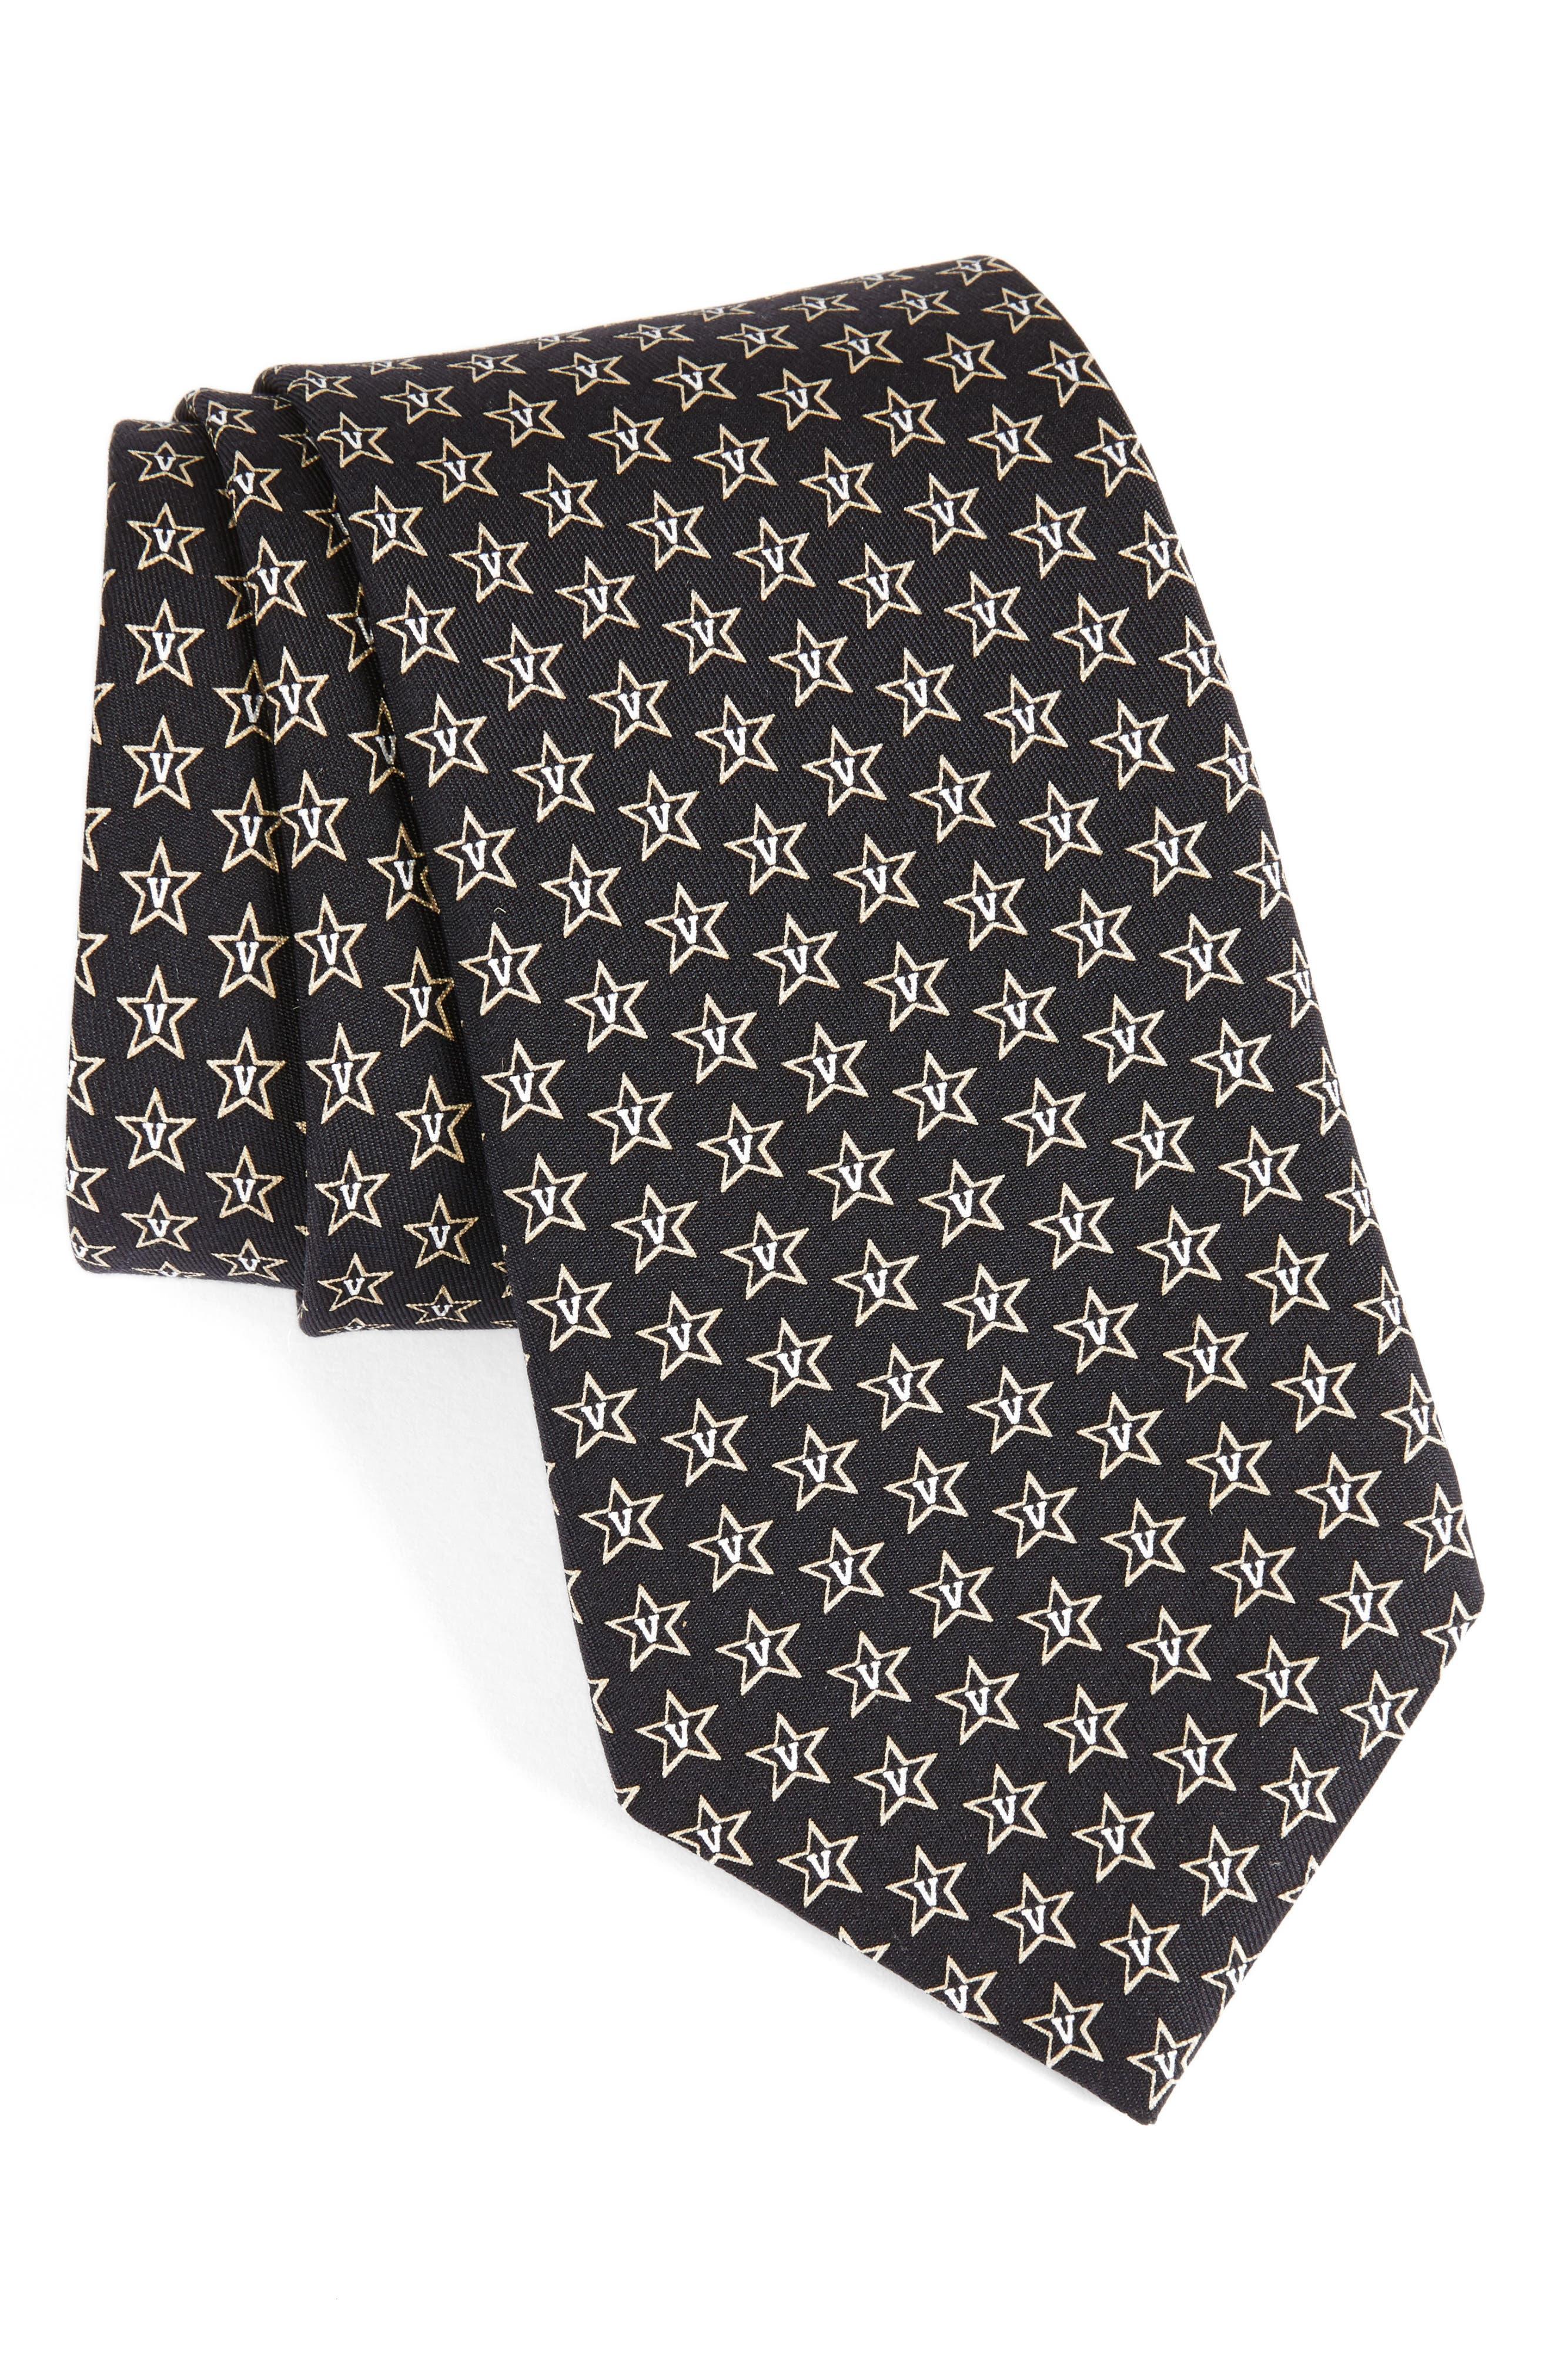 Vineyard Vines Vanderbilt University Silk Tie